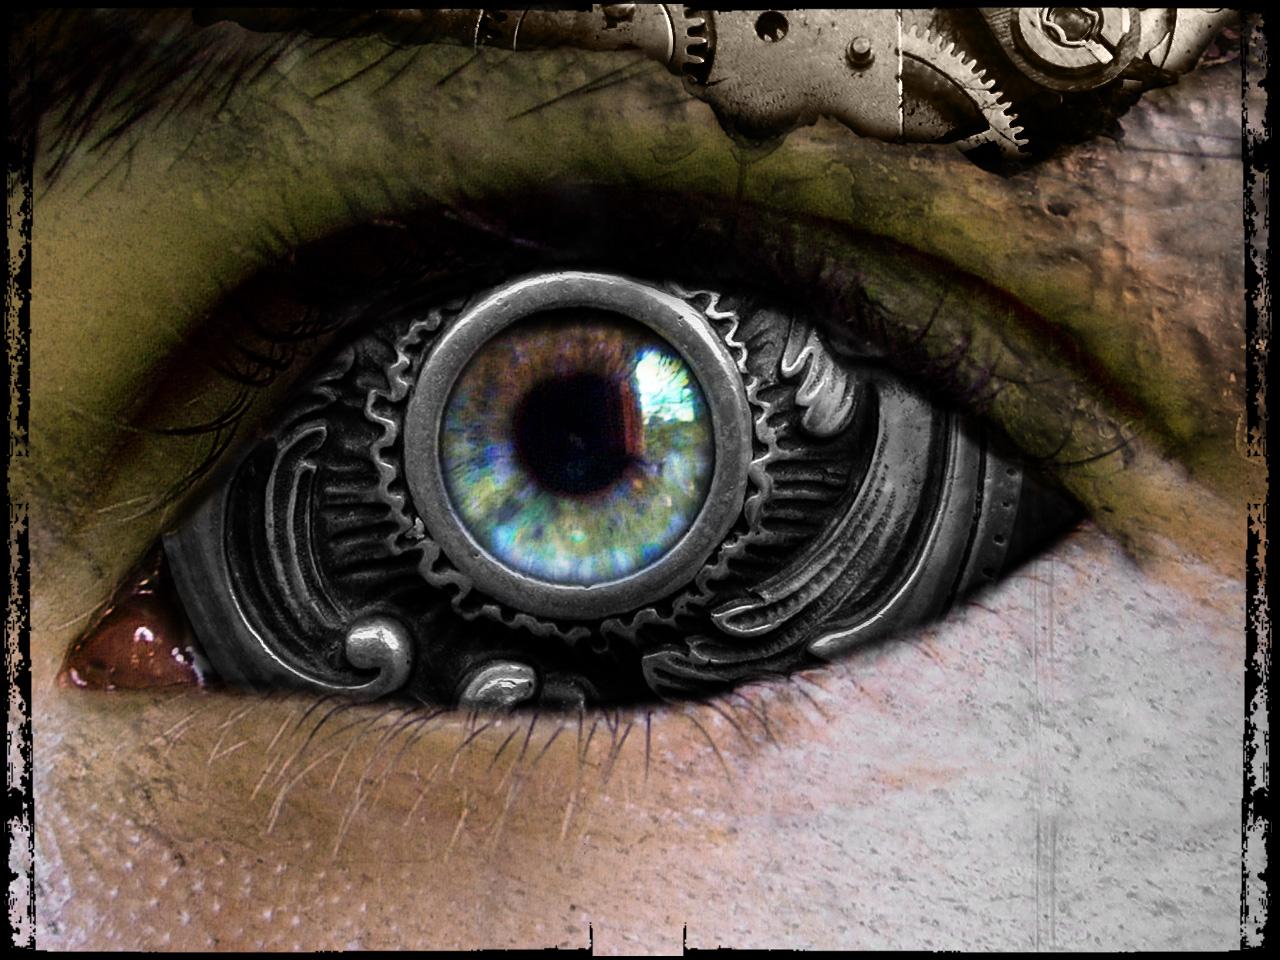 Eye Computer Wallpapers Desktop Backgrounds 1280x960 ID5341 1280x960